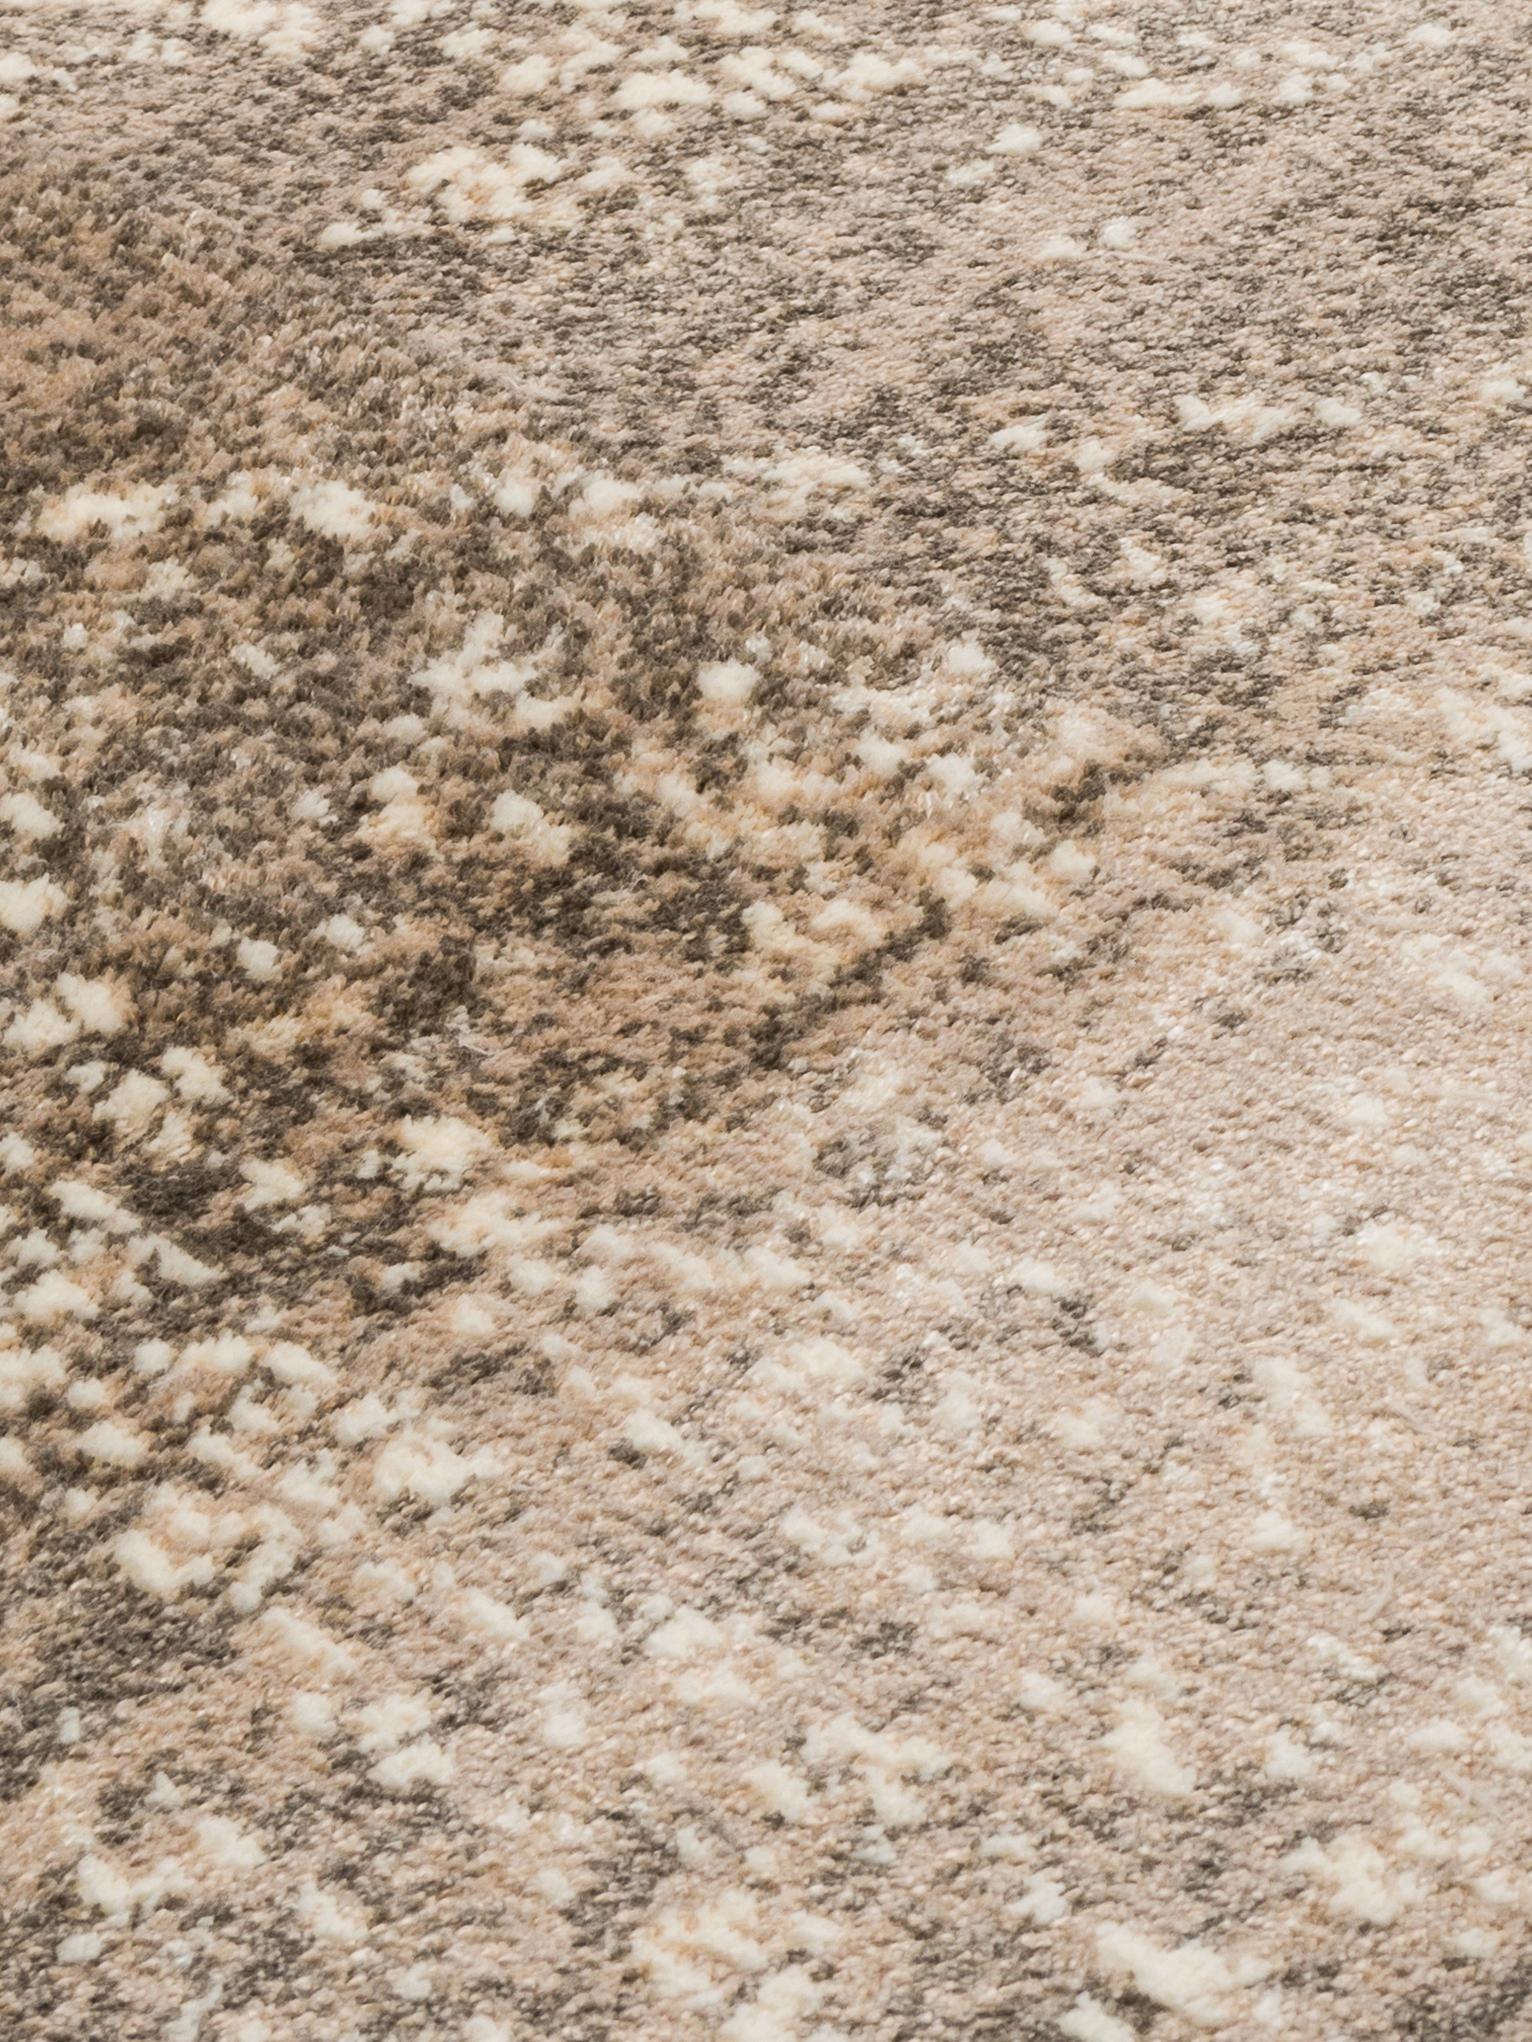 Tapis vintage beige brun Rugged, Beige, brun